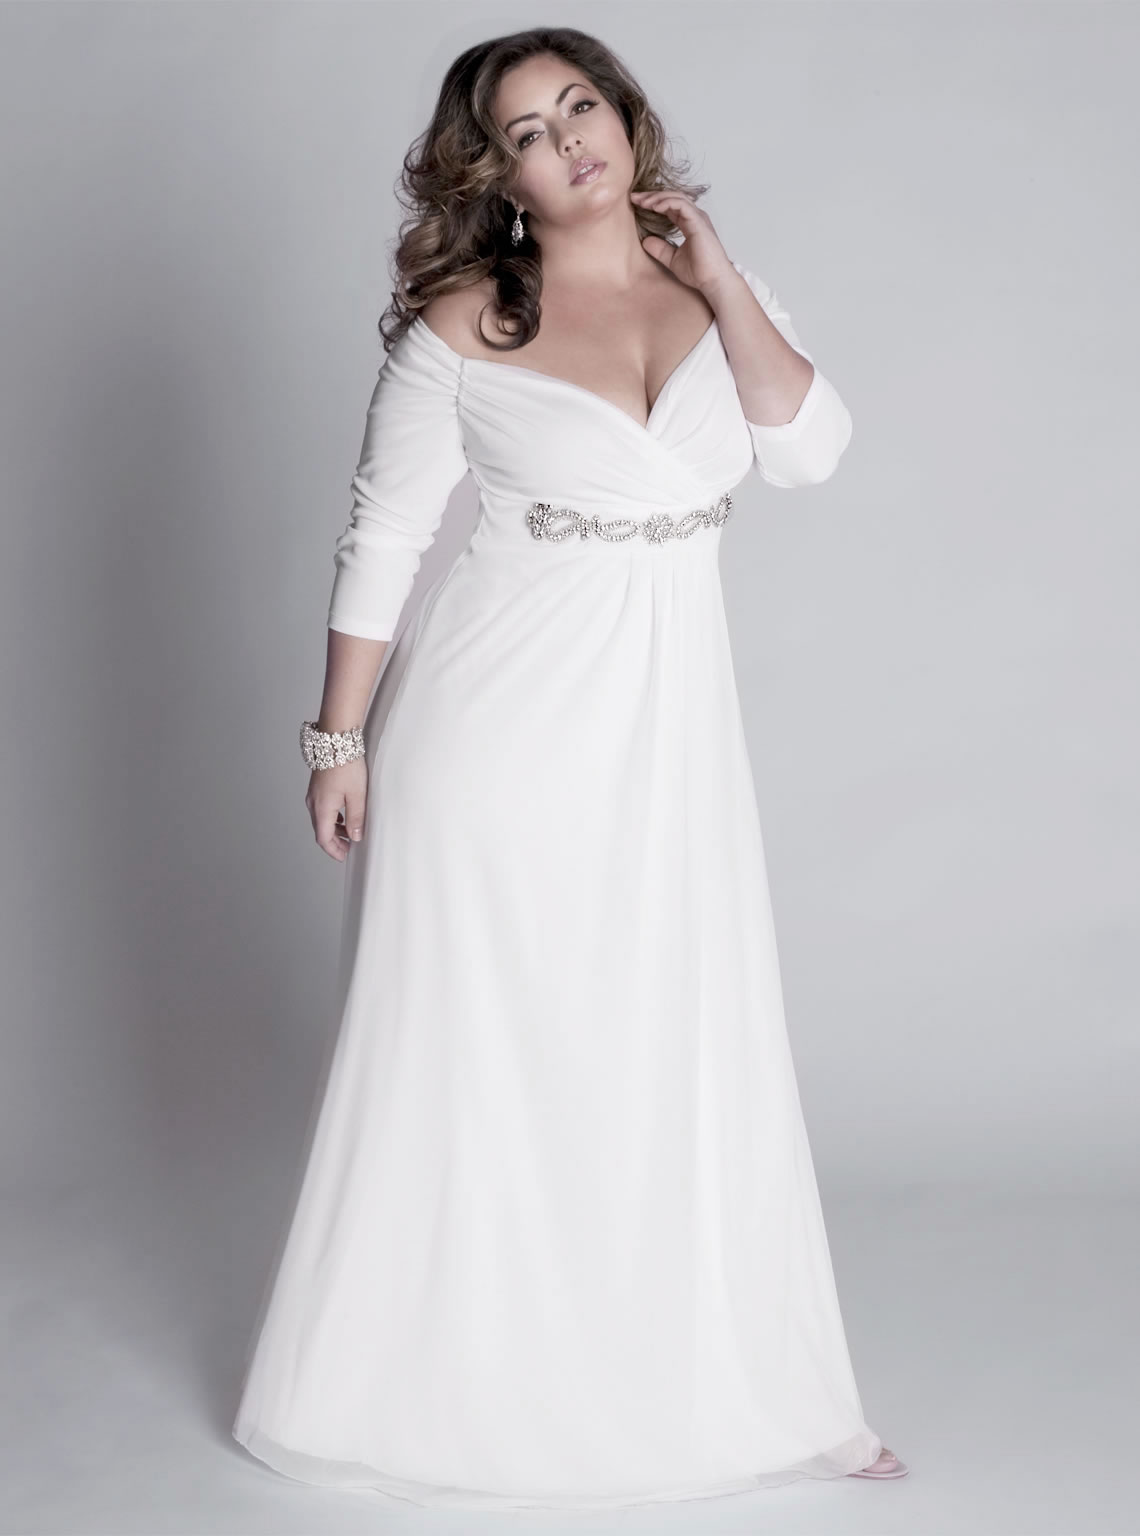 informal plus size wedding dresses photo - 1